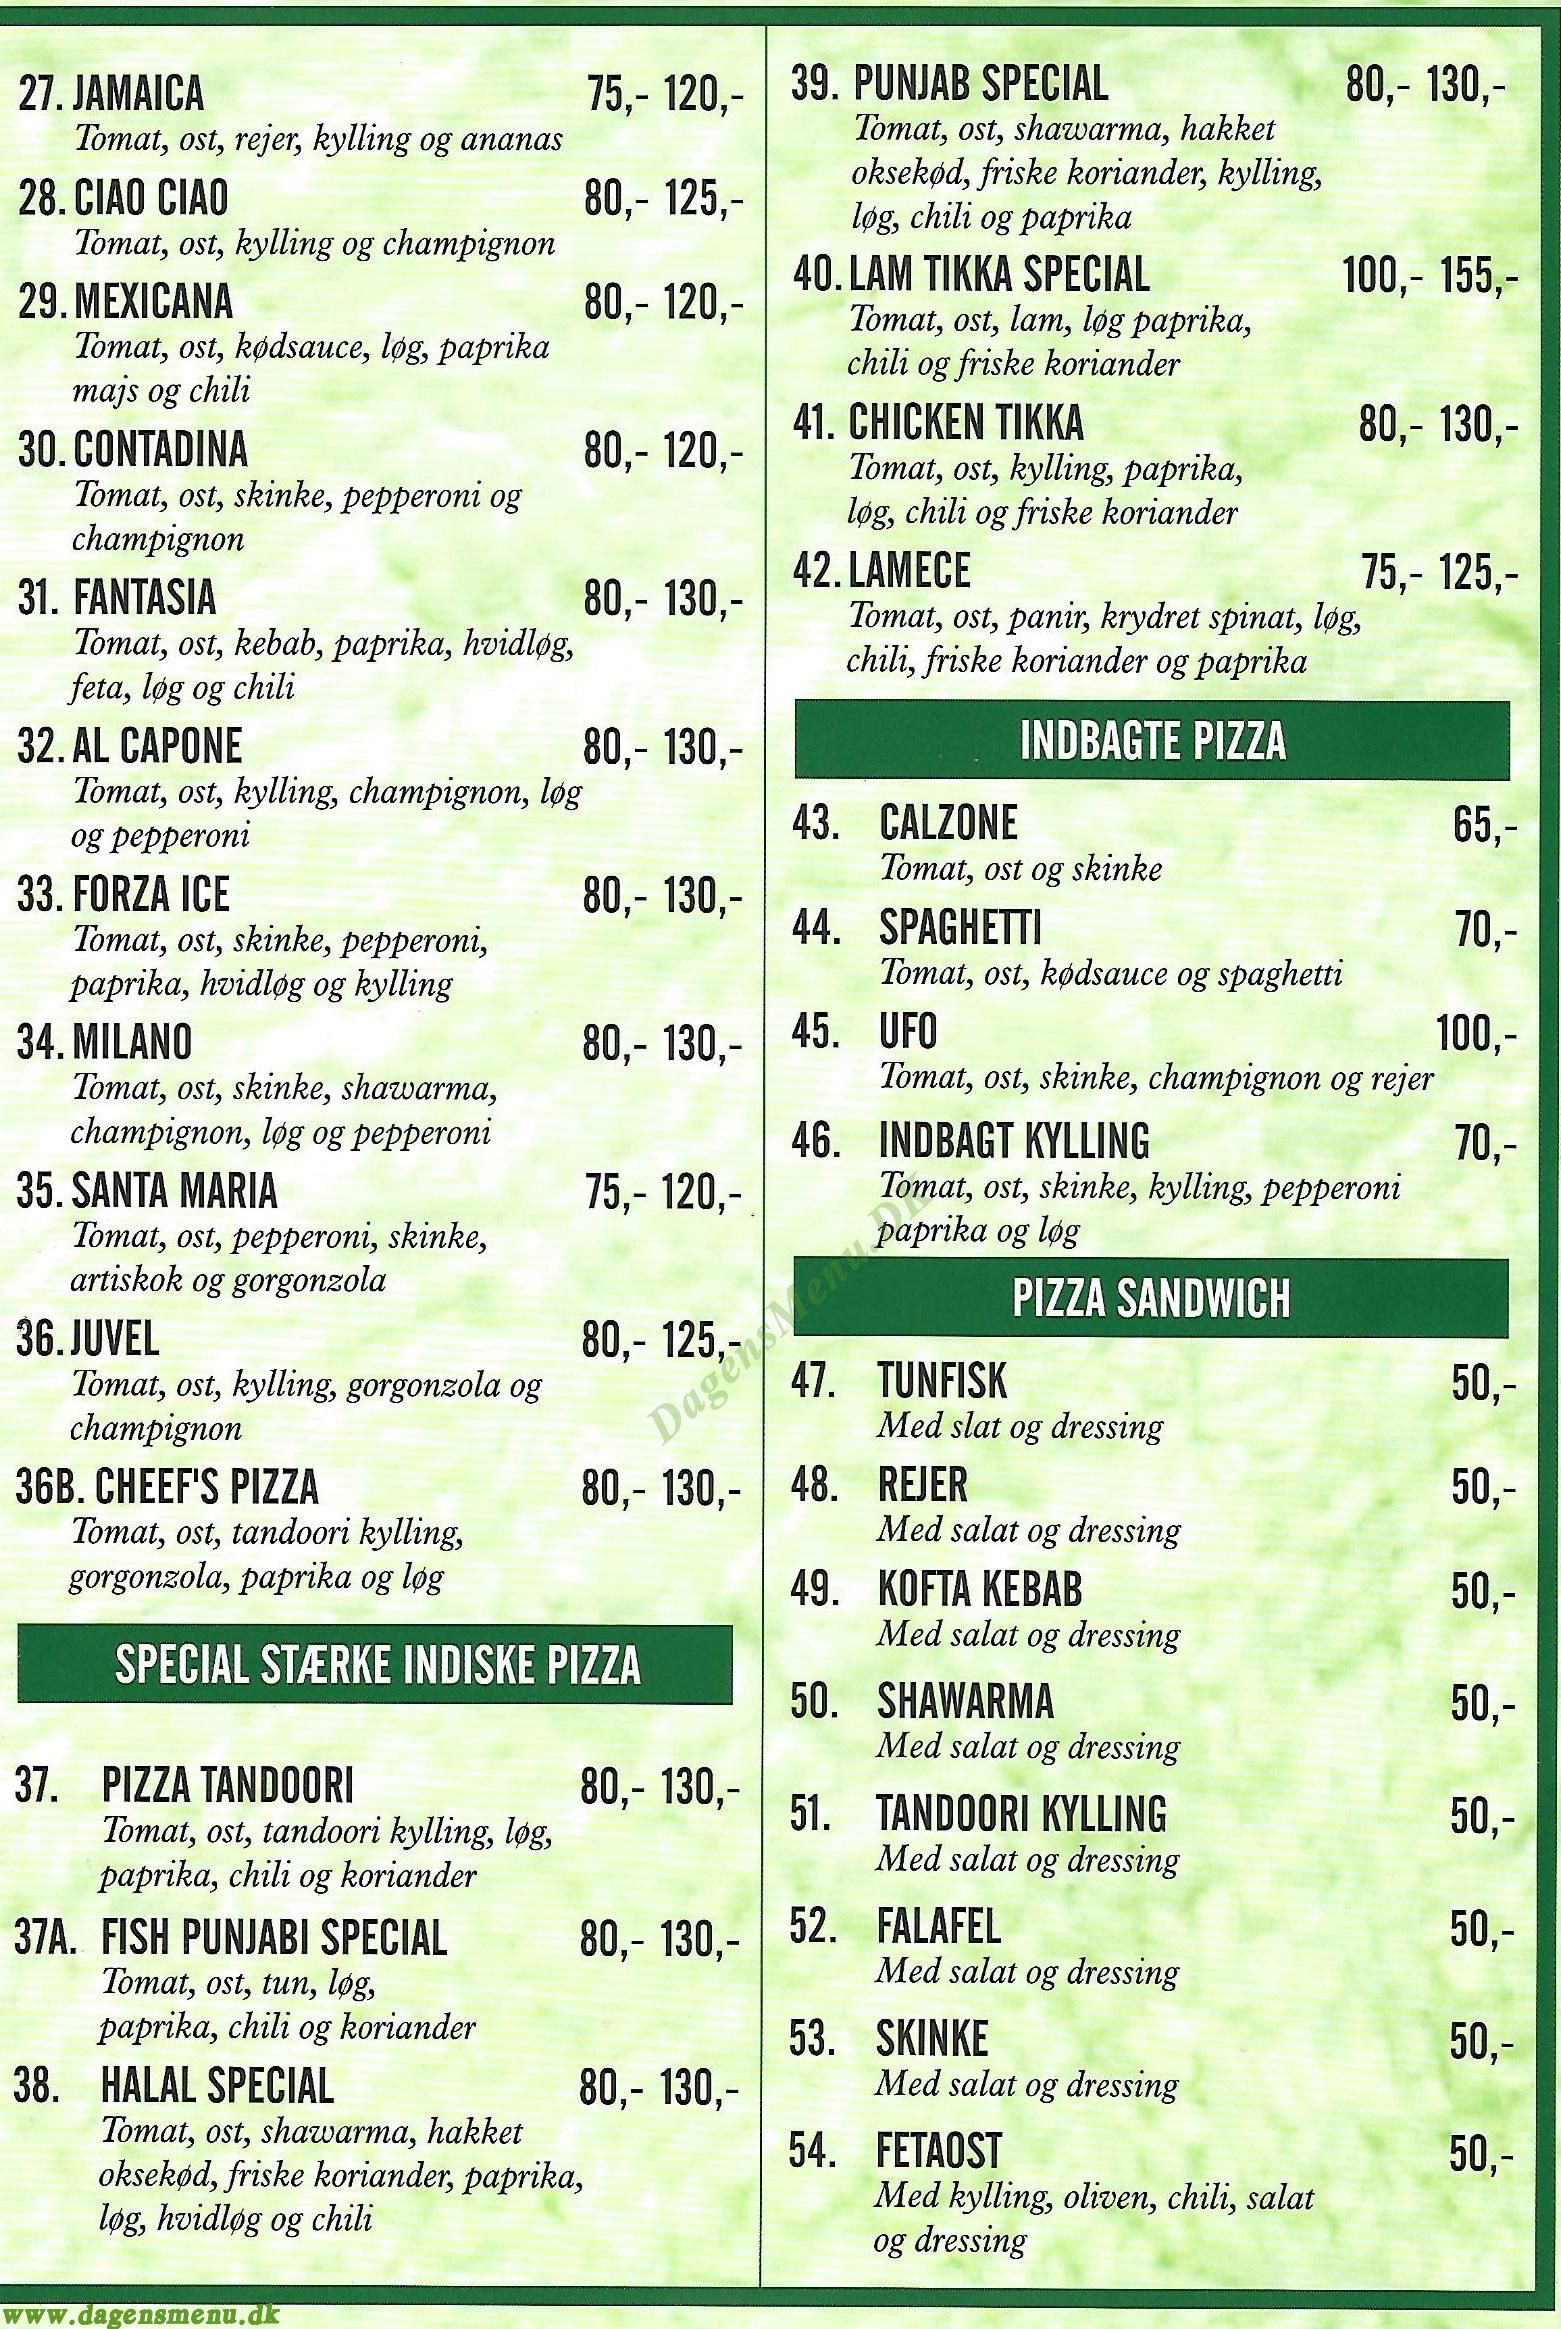 Venus Pizza & Orientalsk Specialitet - Menukort